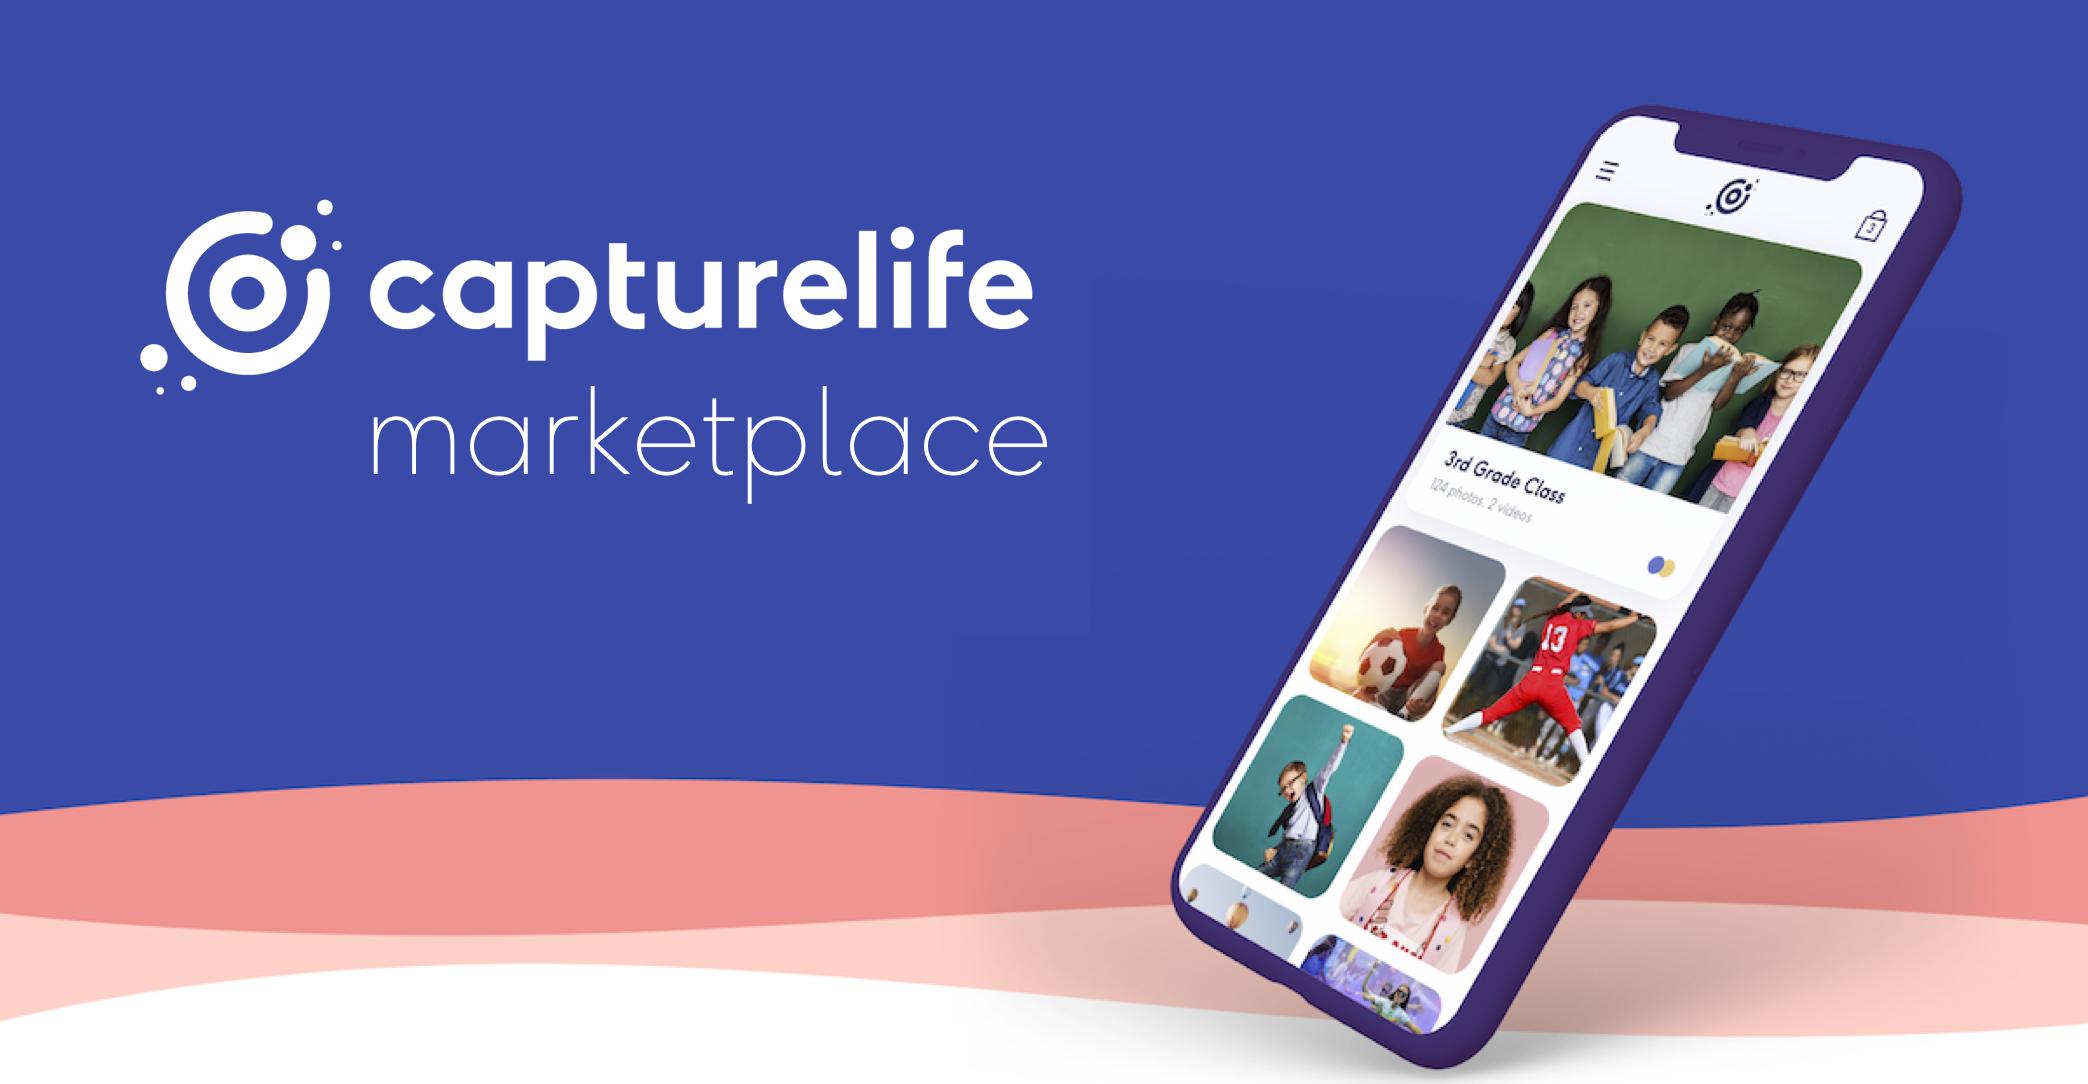 Capturelife Marketplace